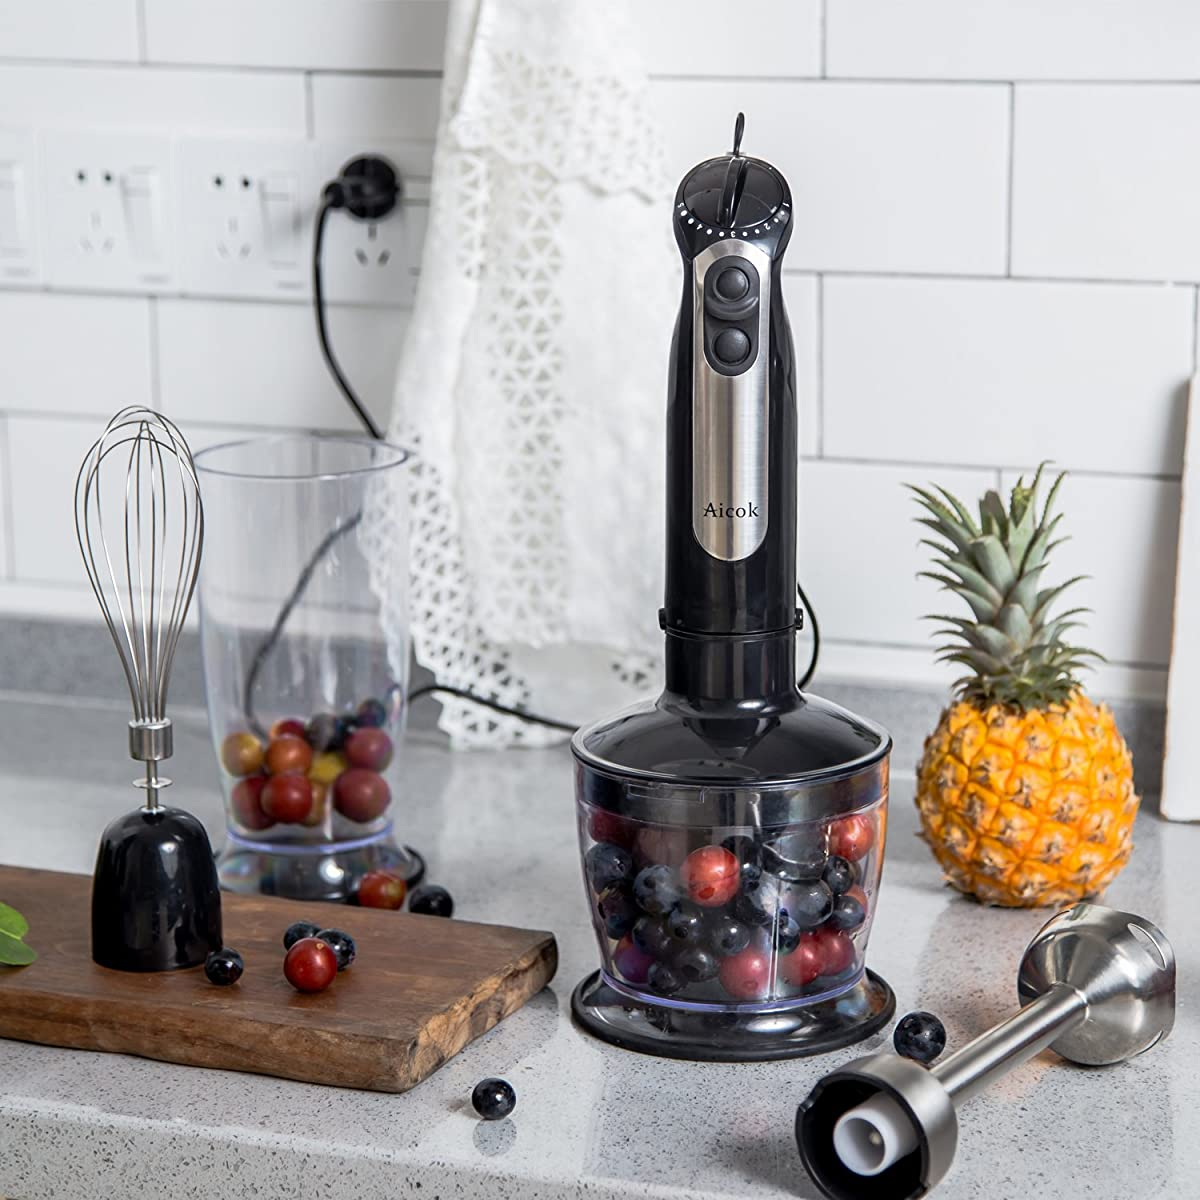 Aicok Immersion Hand Blender Mixer 5 Speed Smart Stick with Chopper & Whisk & Beaker Set, 350W, 4-in-1